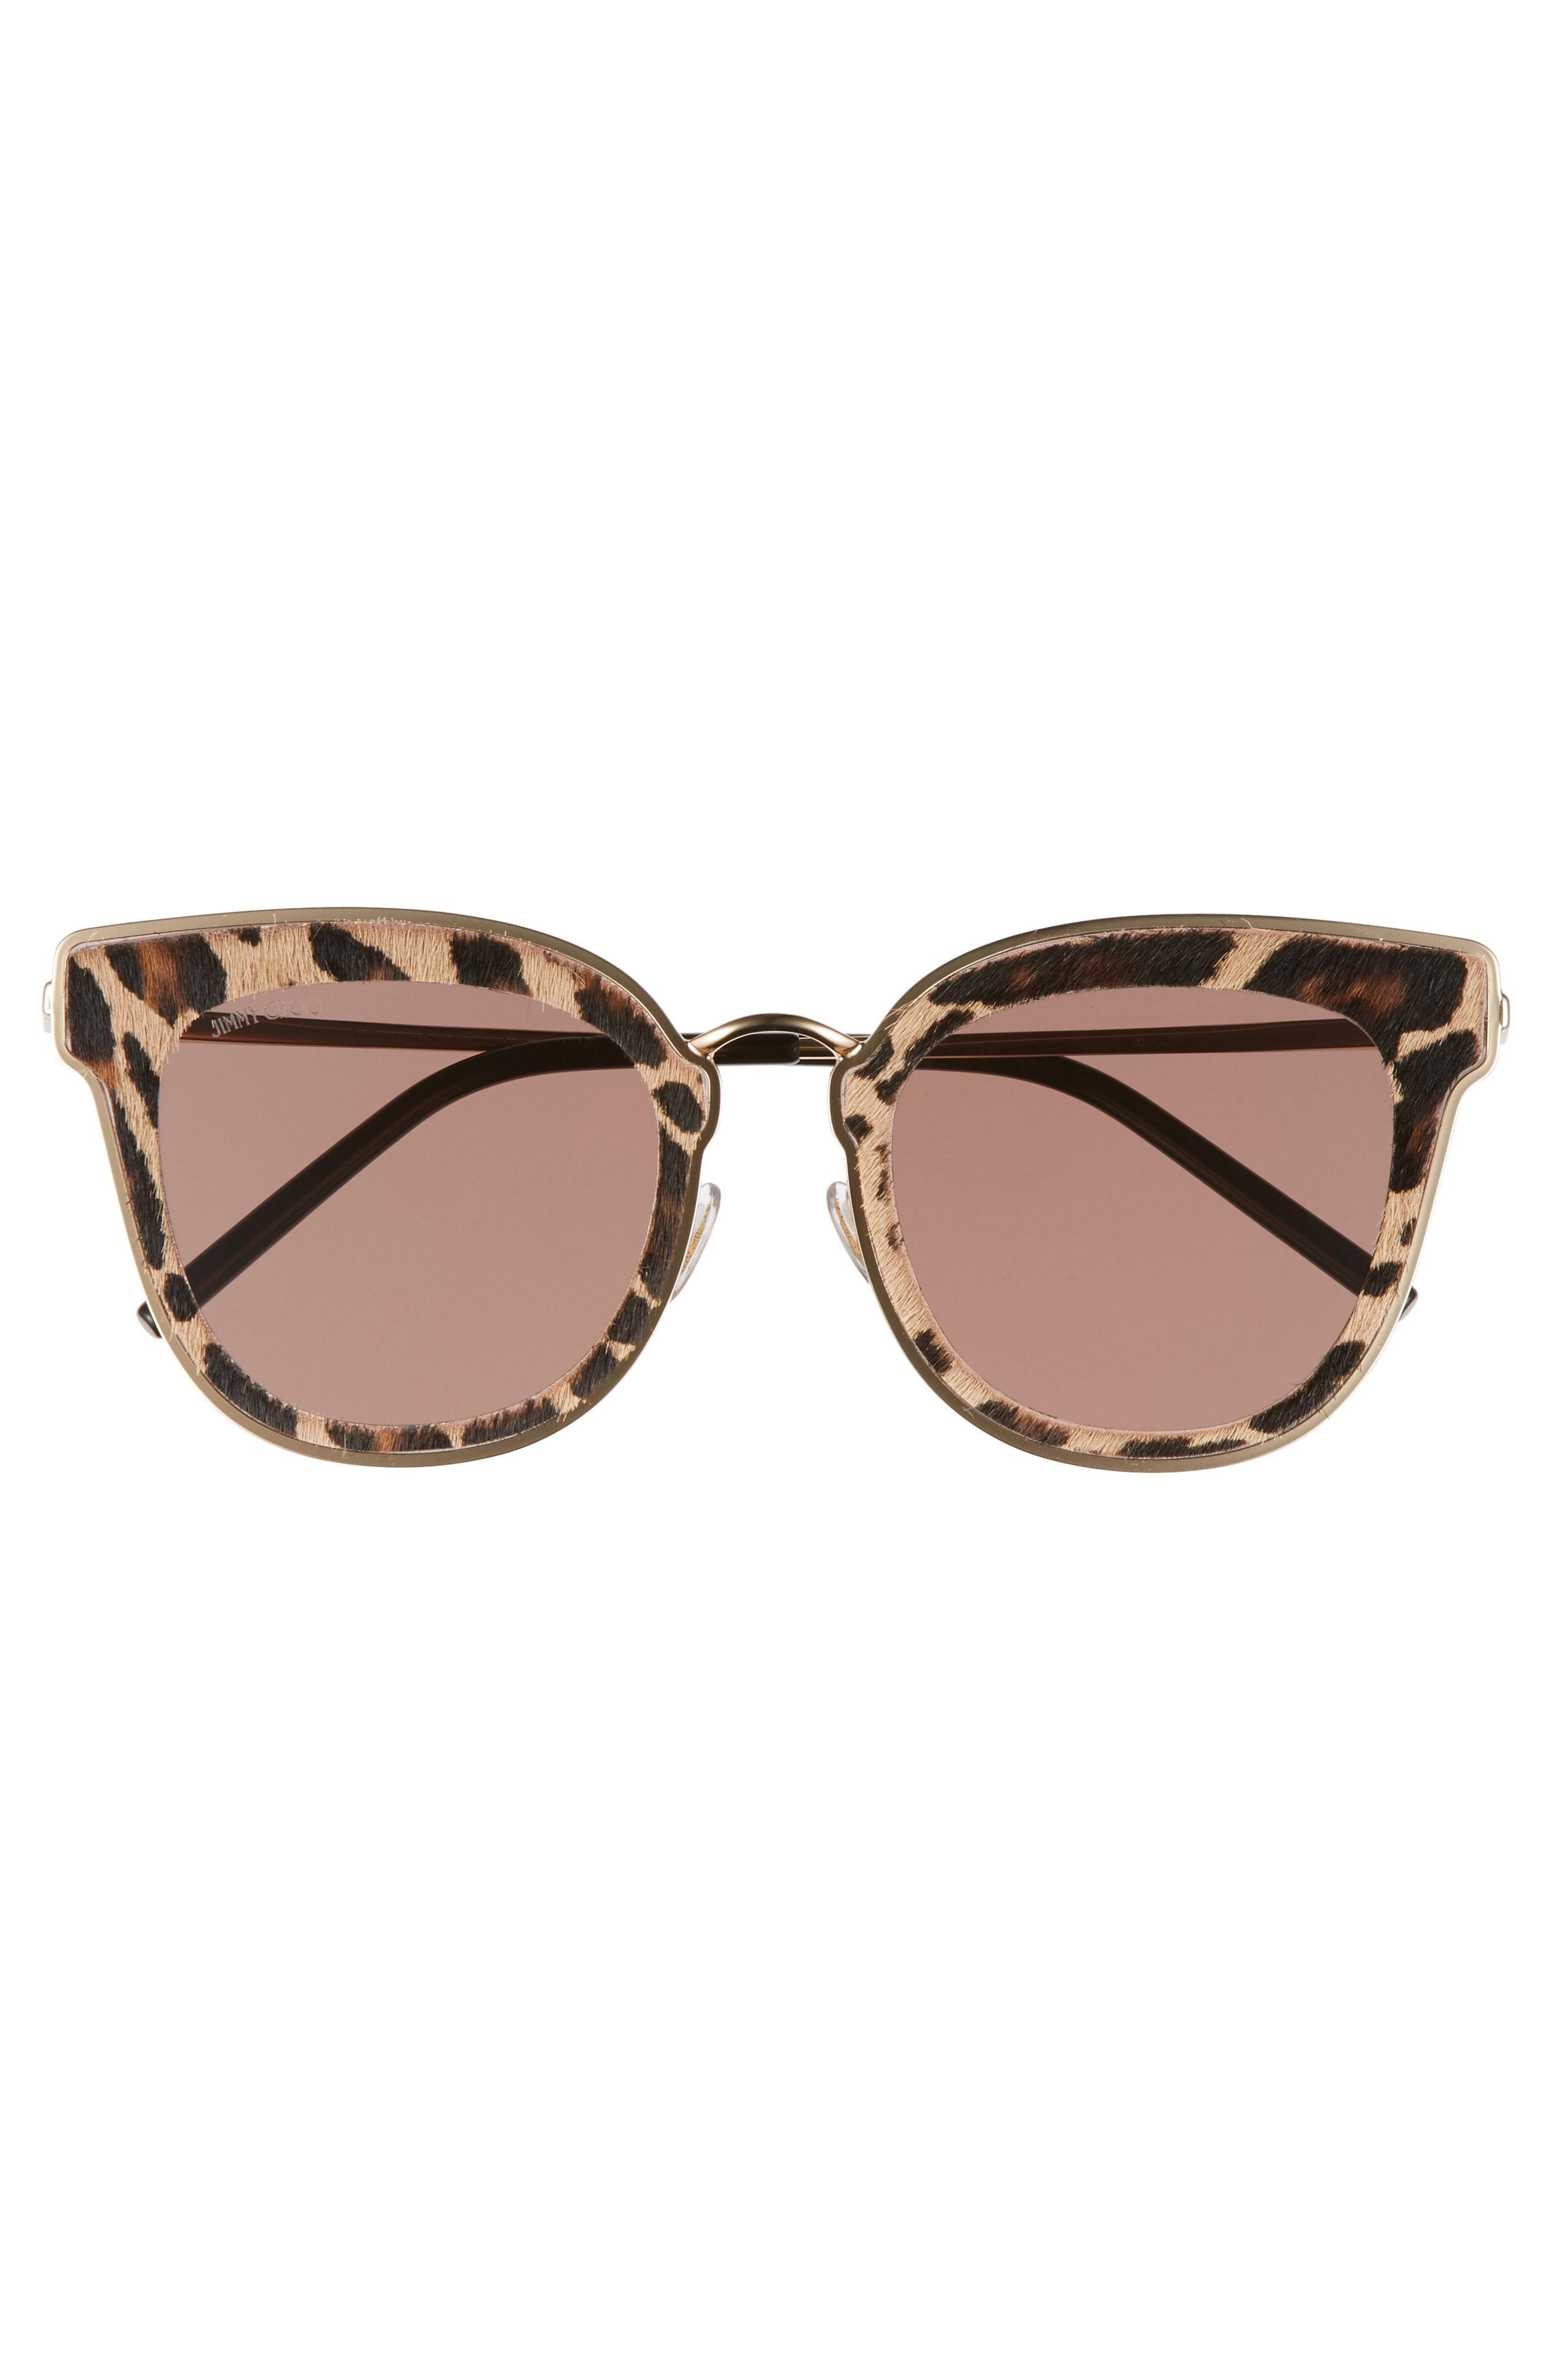 f94d11ab71a Jimmy Choo Niles 63Mm Oversize Cat Eye Sunglasses - Gold Black Leopard